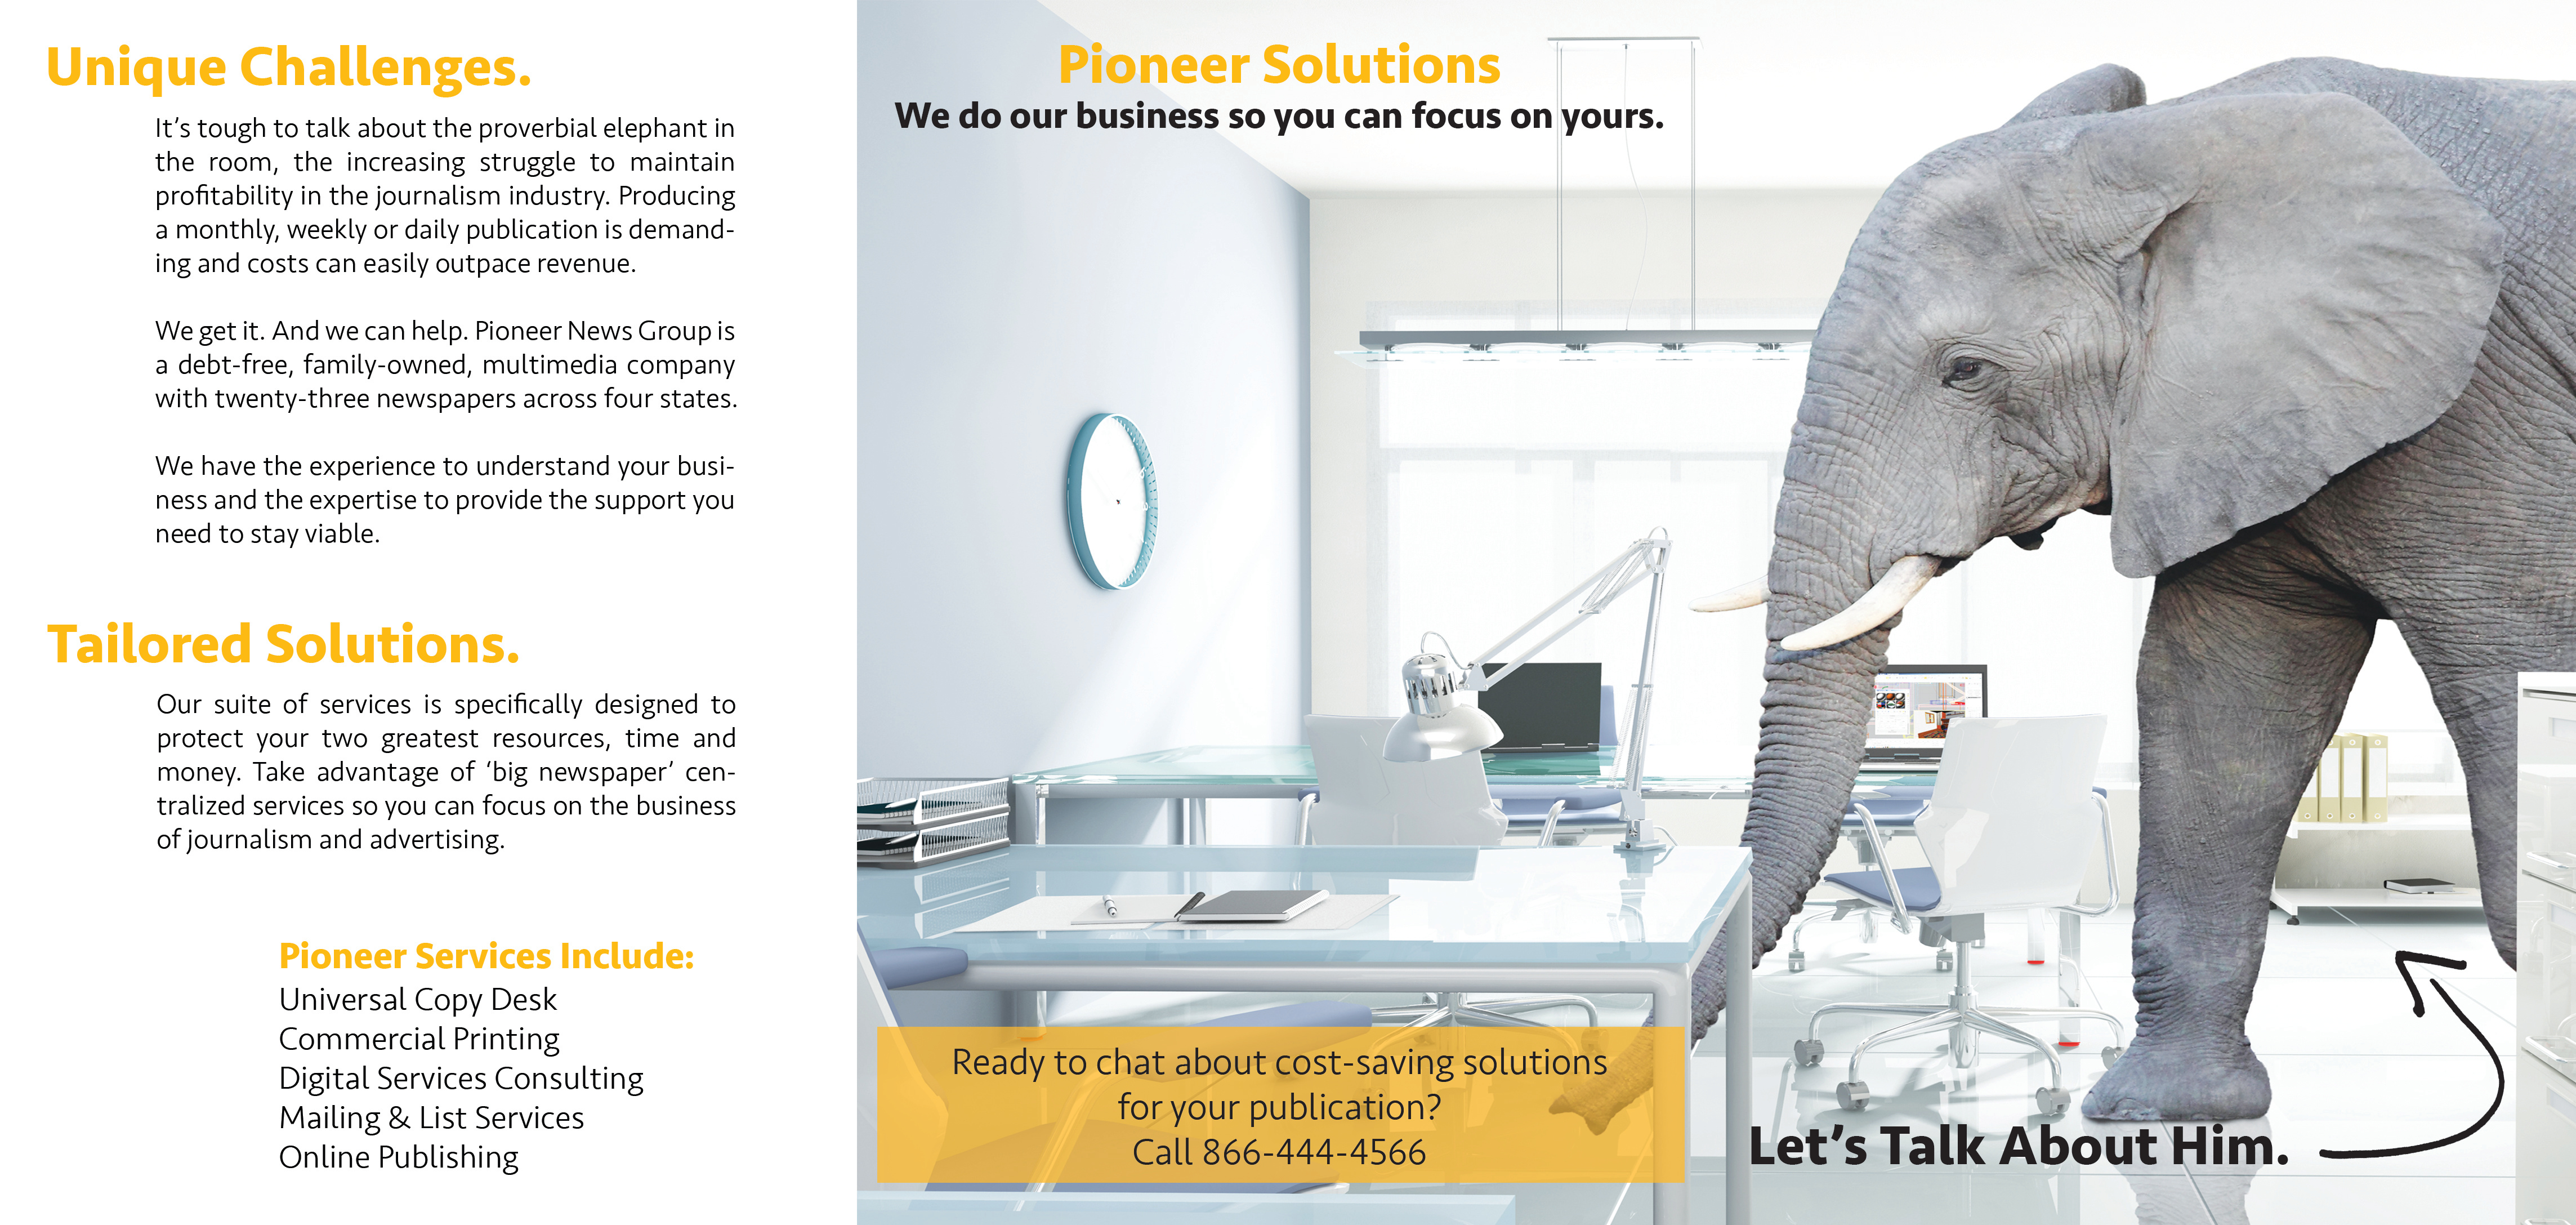 Copy Desk Services Ad